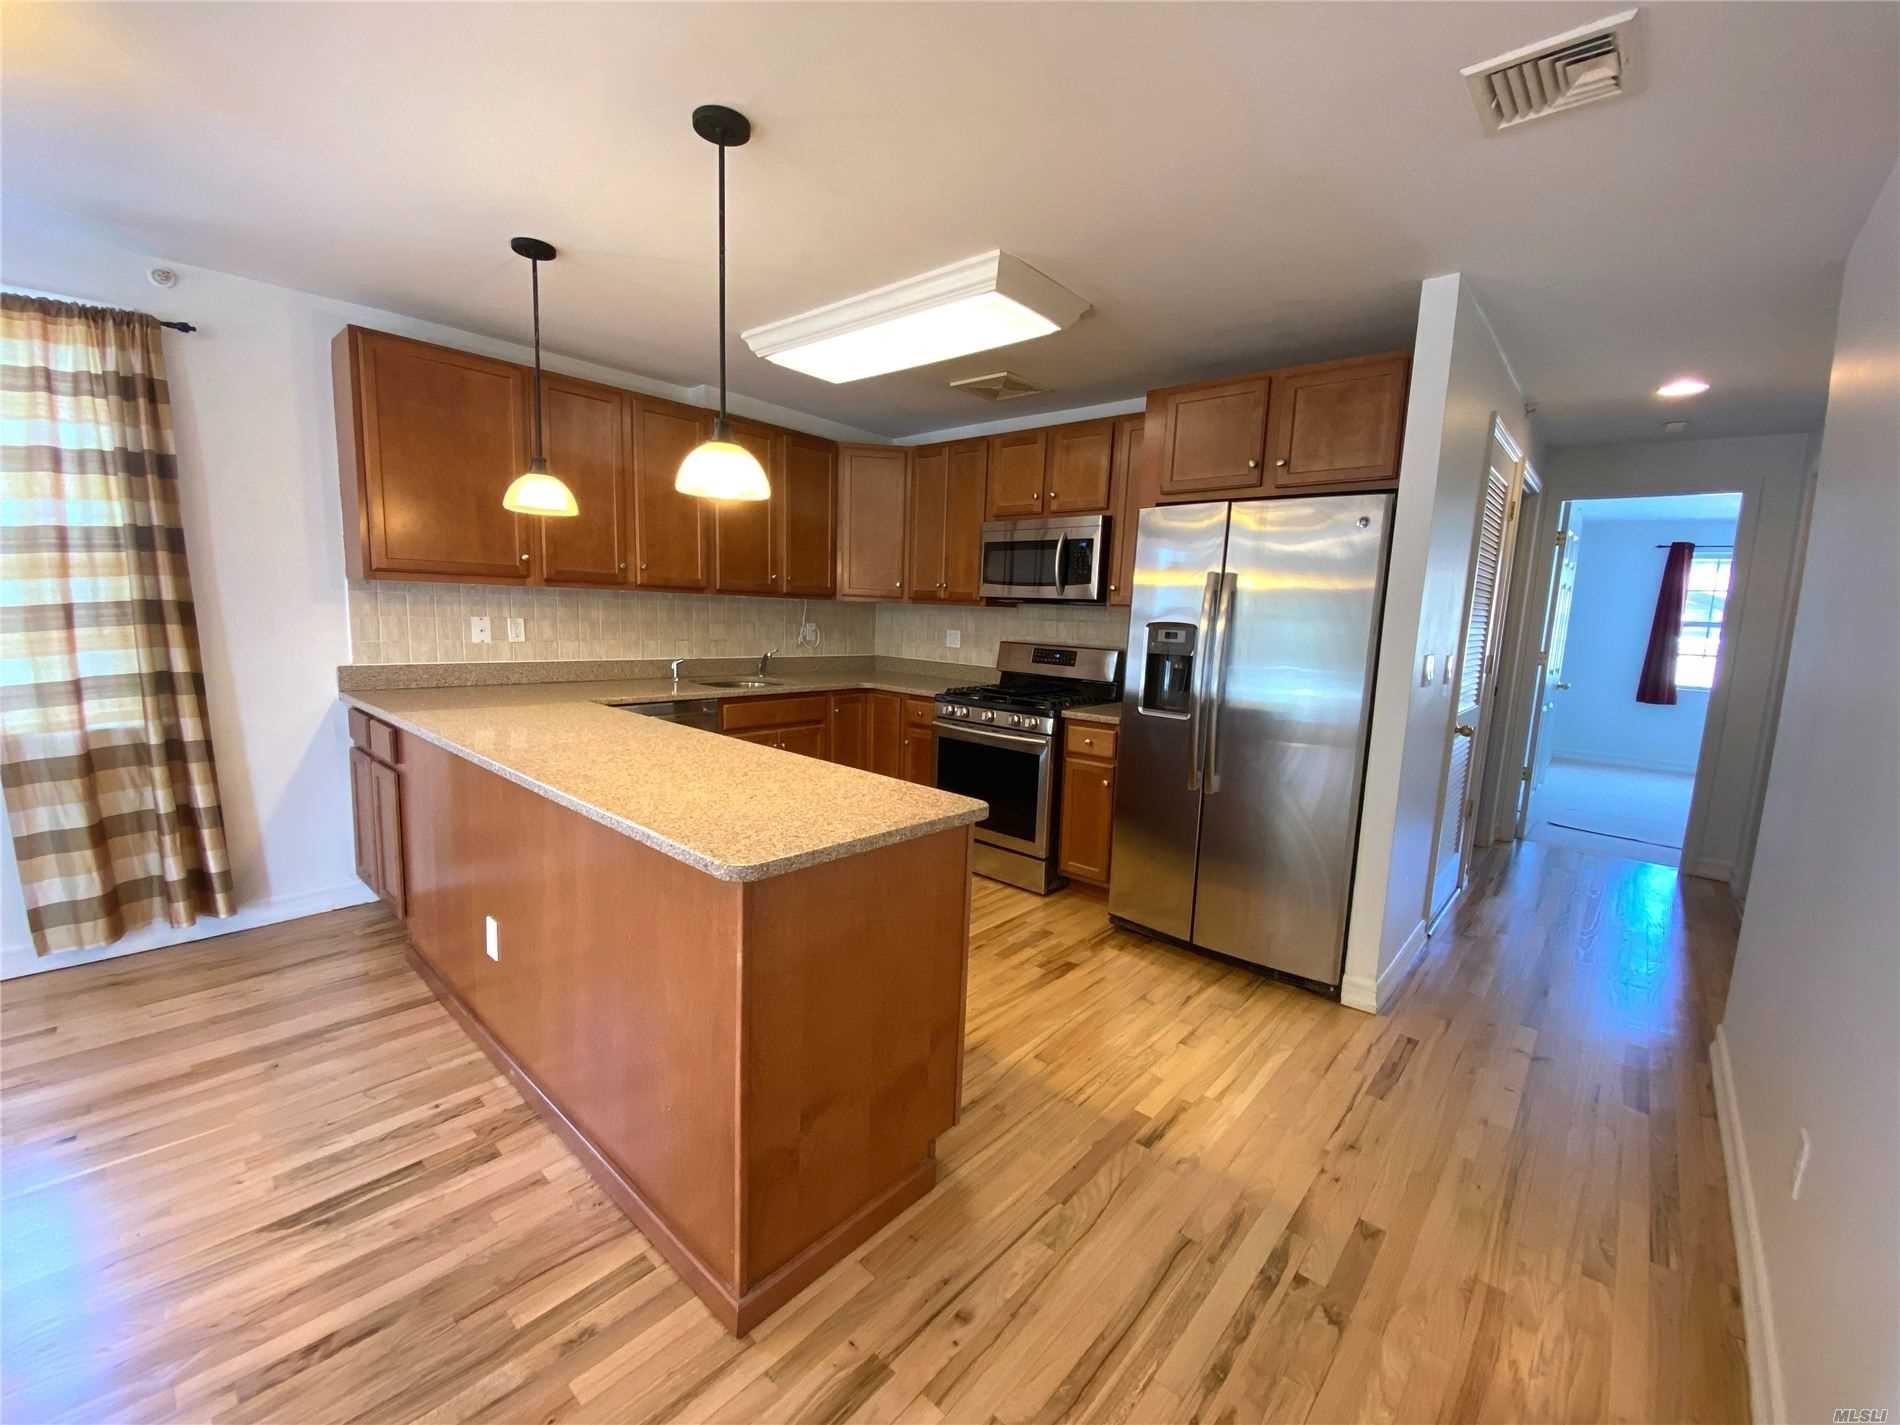 103-16 Rockaway Beach Boulevard #B, Far Rockaway, NY 11694 - MLS#: 3232300